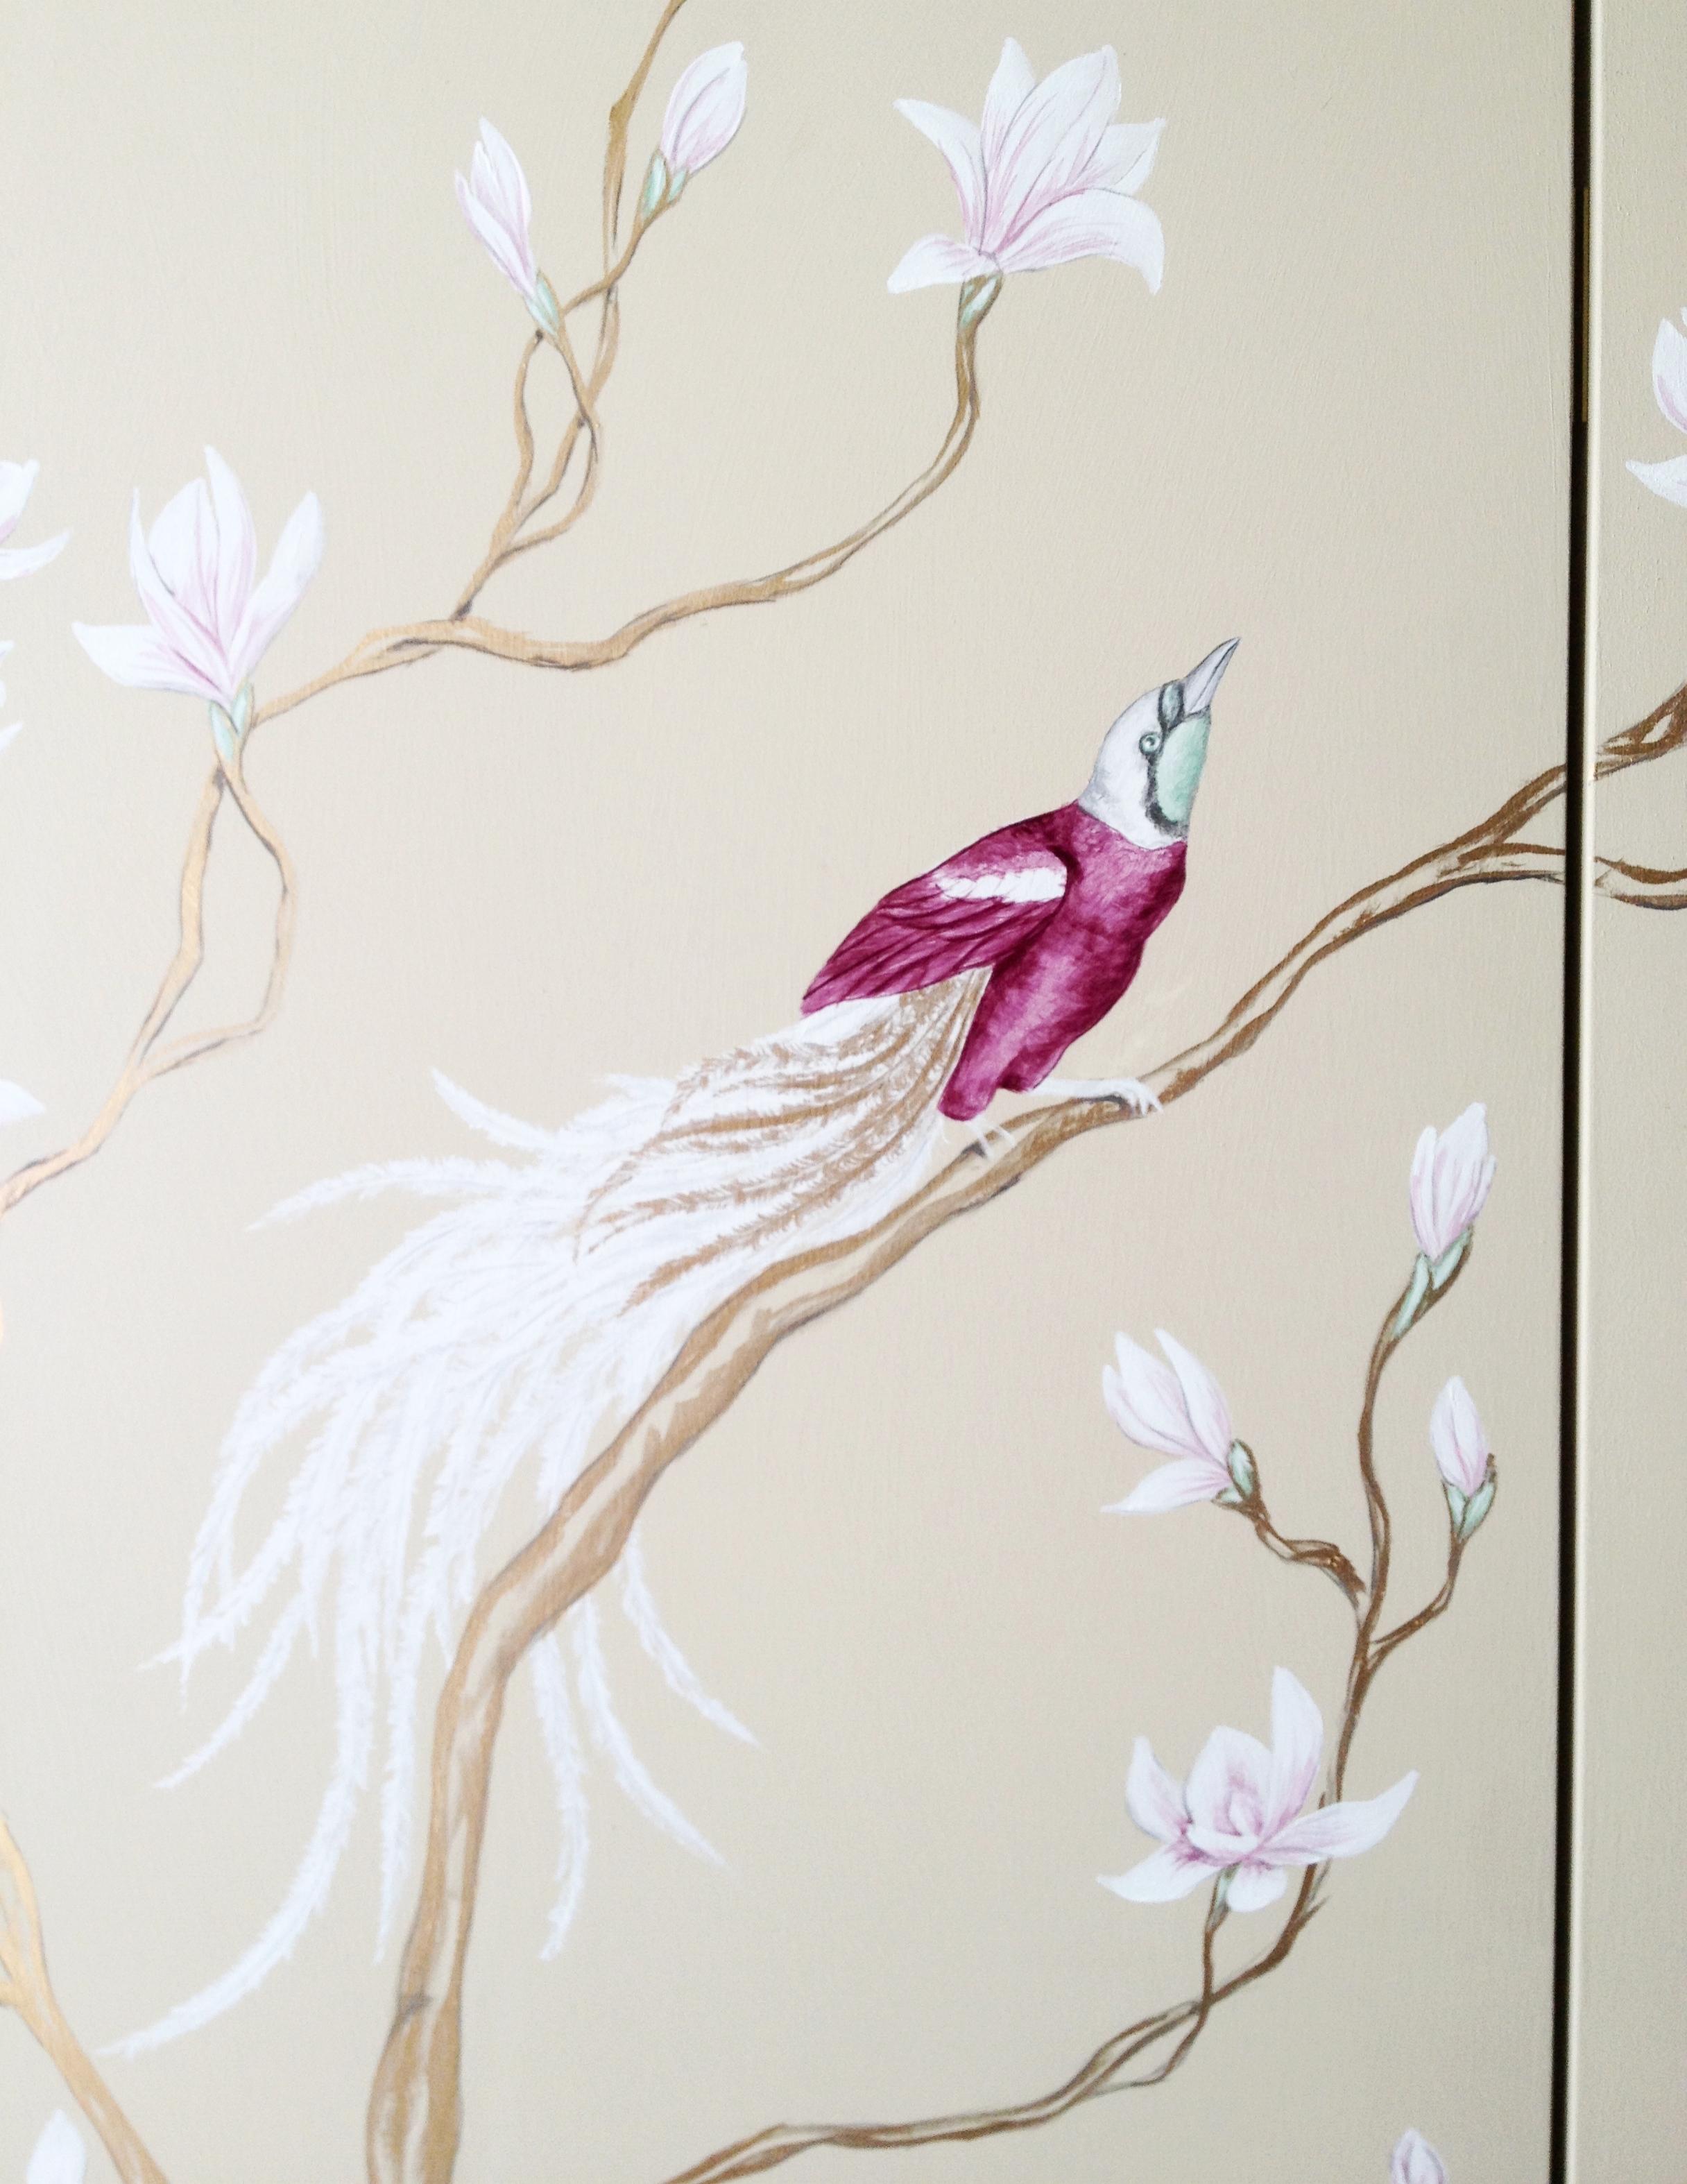 Magnolia and Bird of Paradise Screen  Frederick Wimsett - murals and artistic design detail 3.JPG